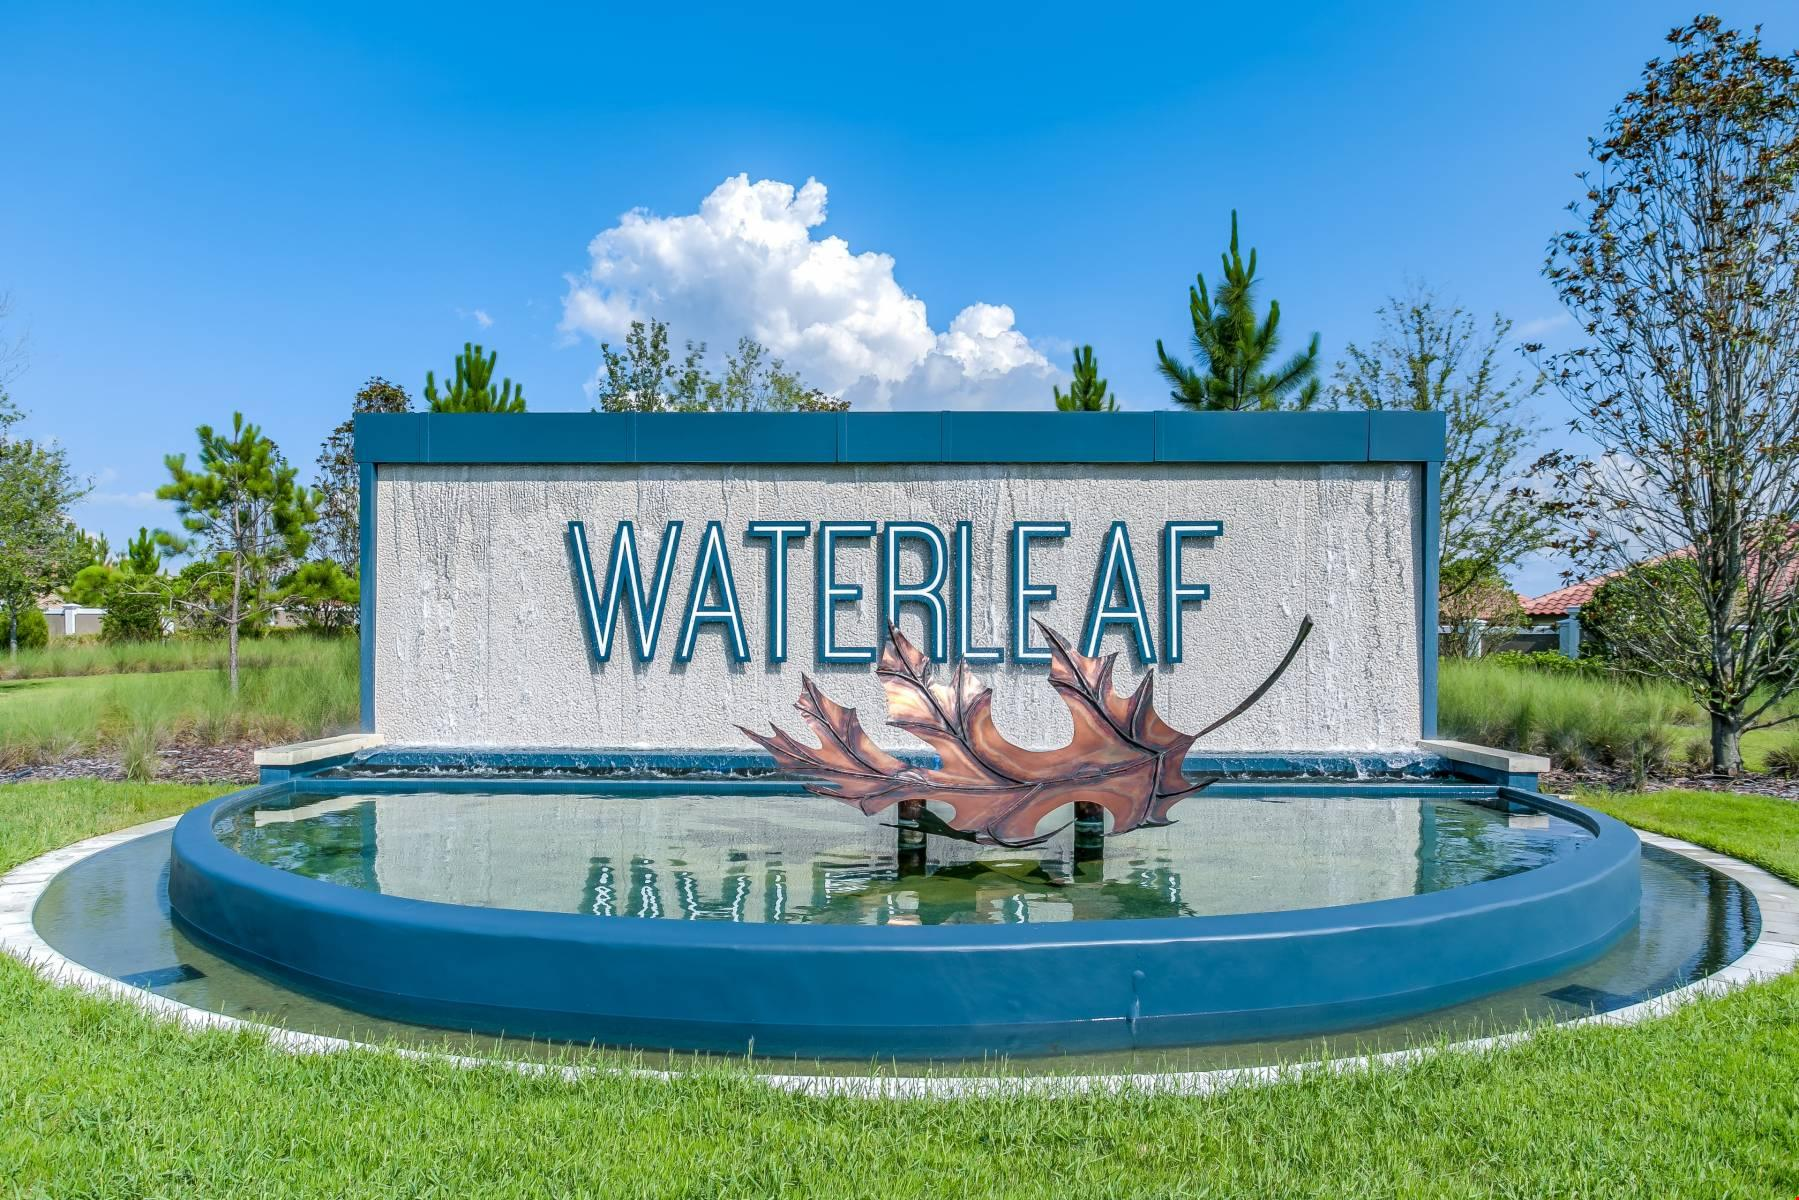 Waterleaf  Riverview Florida Real Estate | Riverview Realtor | New Homes for Sale